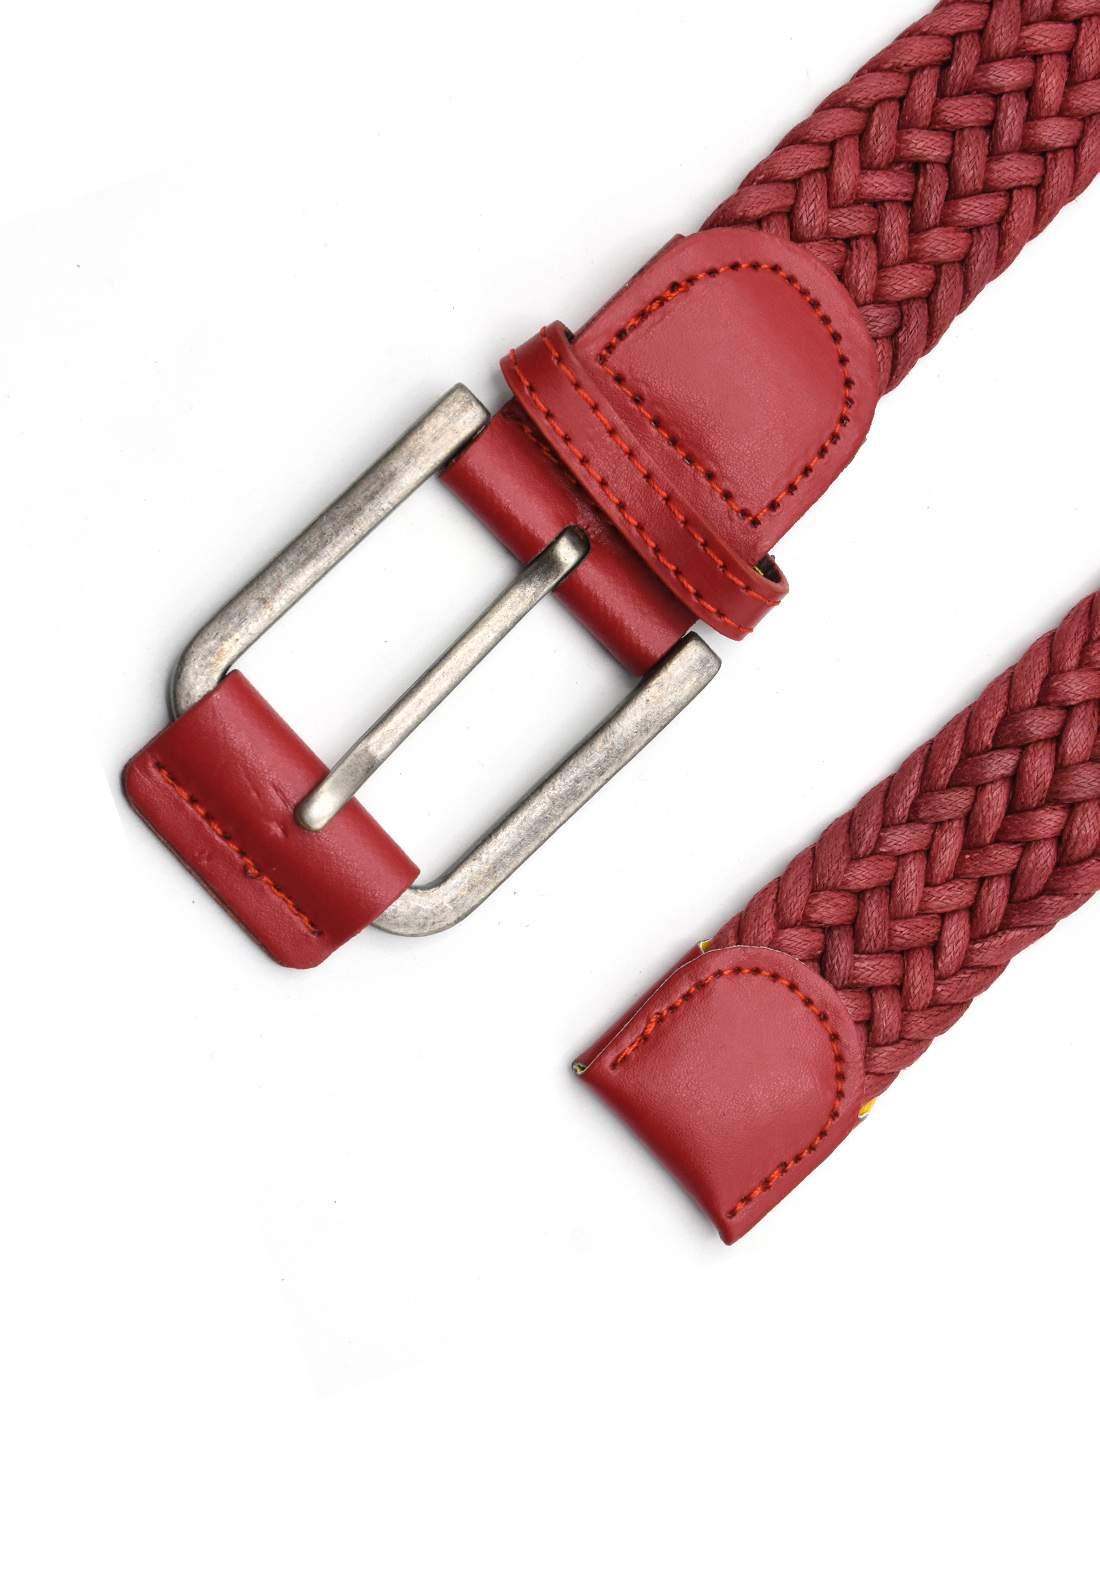 حزام نسائي أحمراللون بأبزيم فضي 116 سم